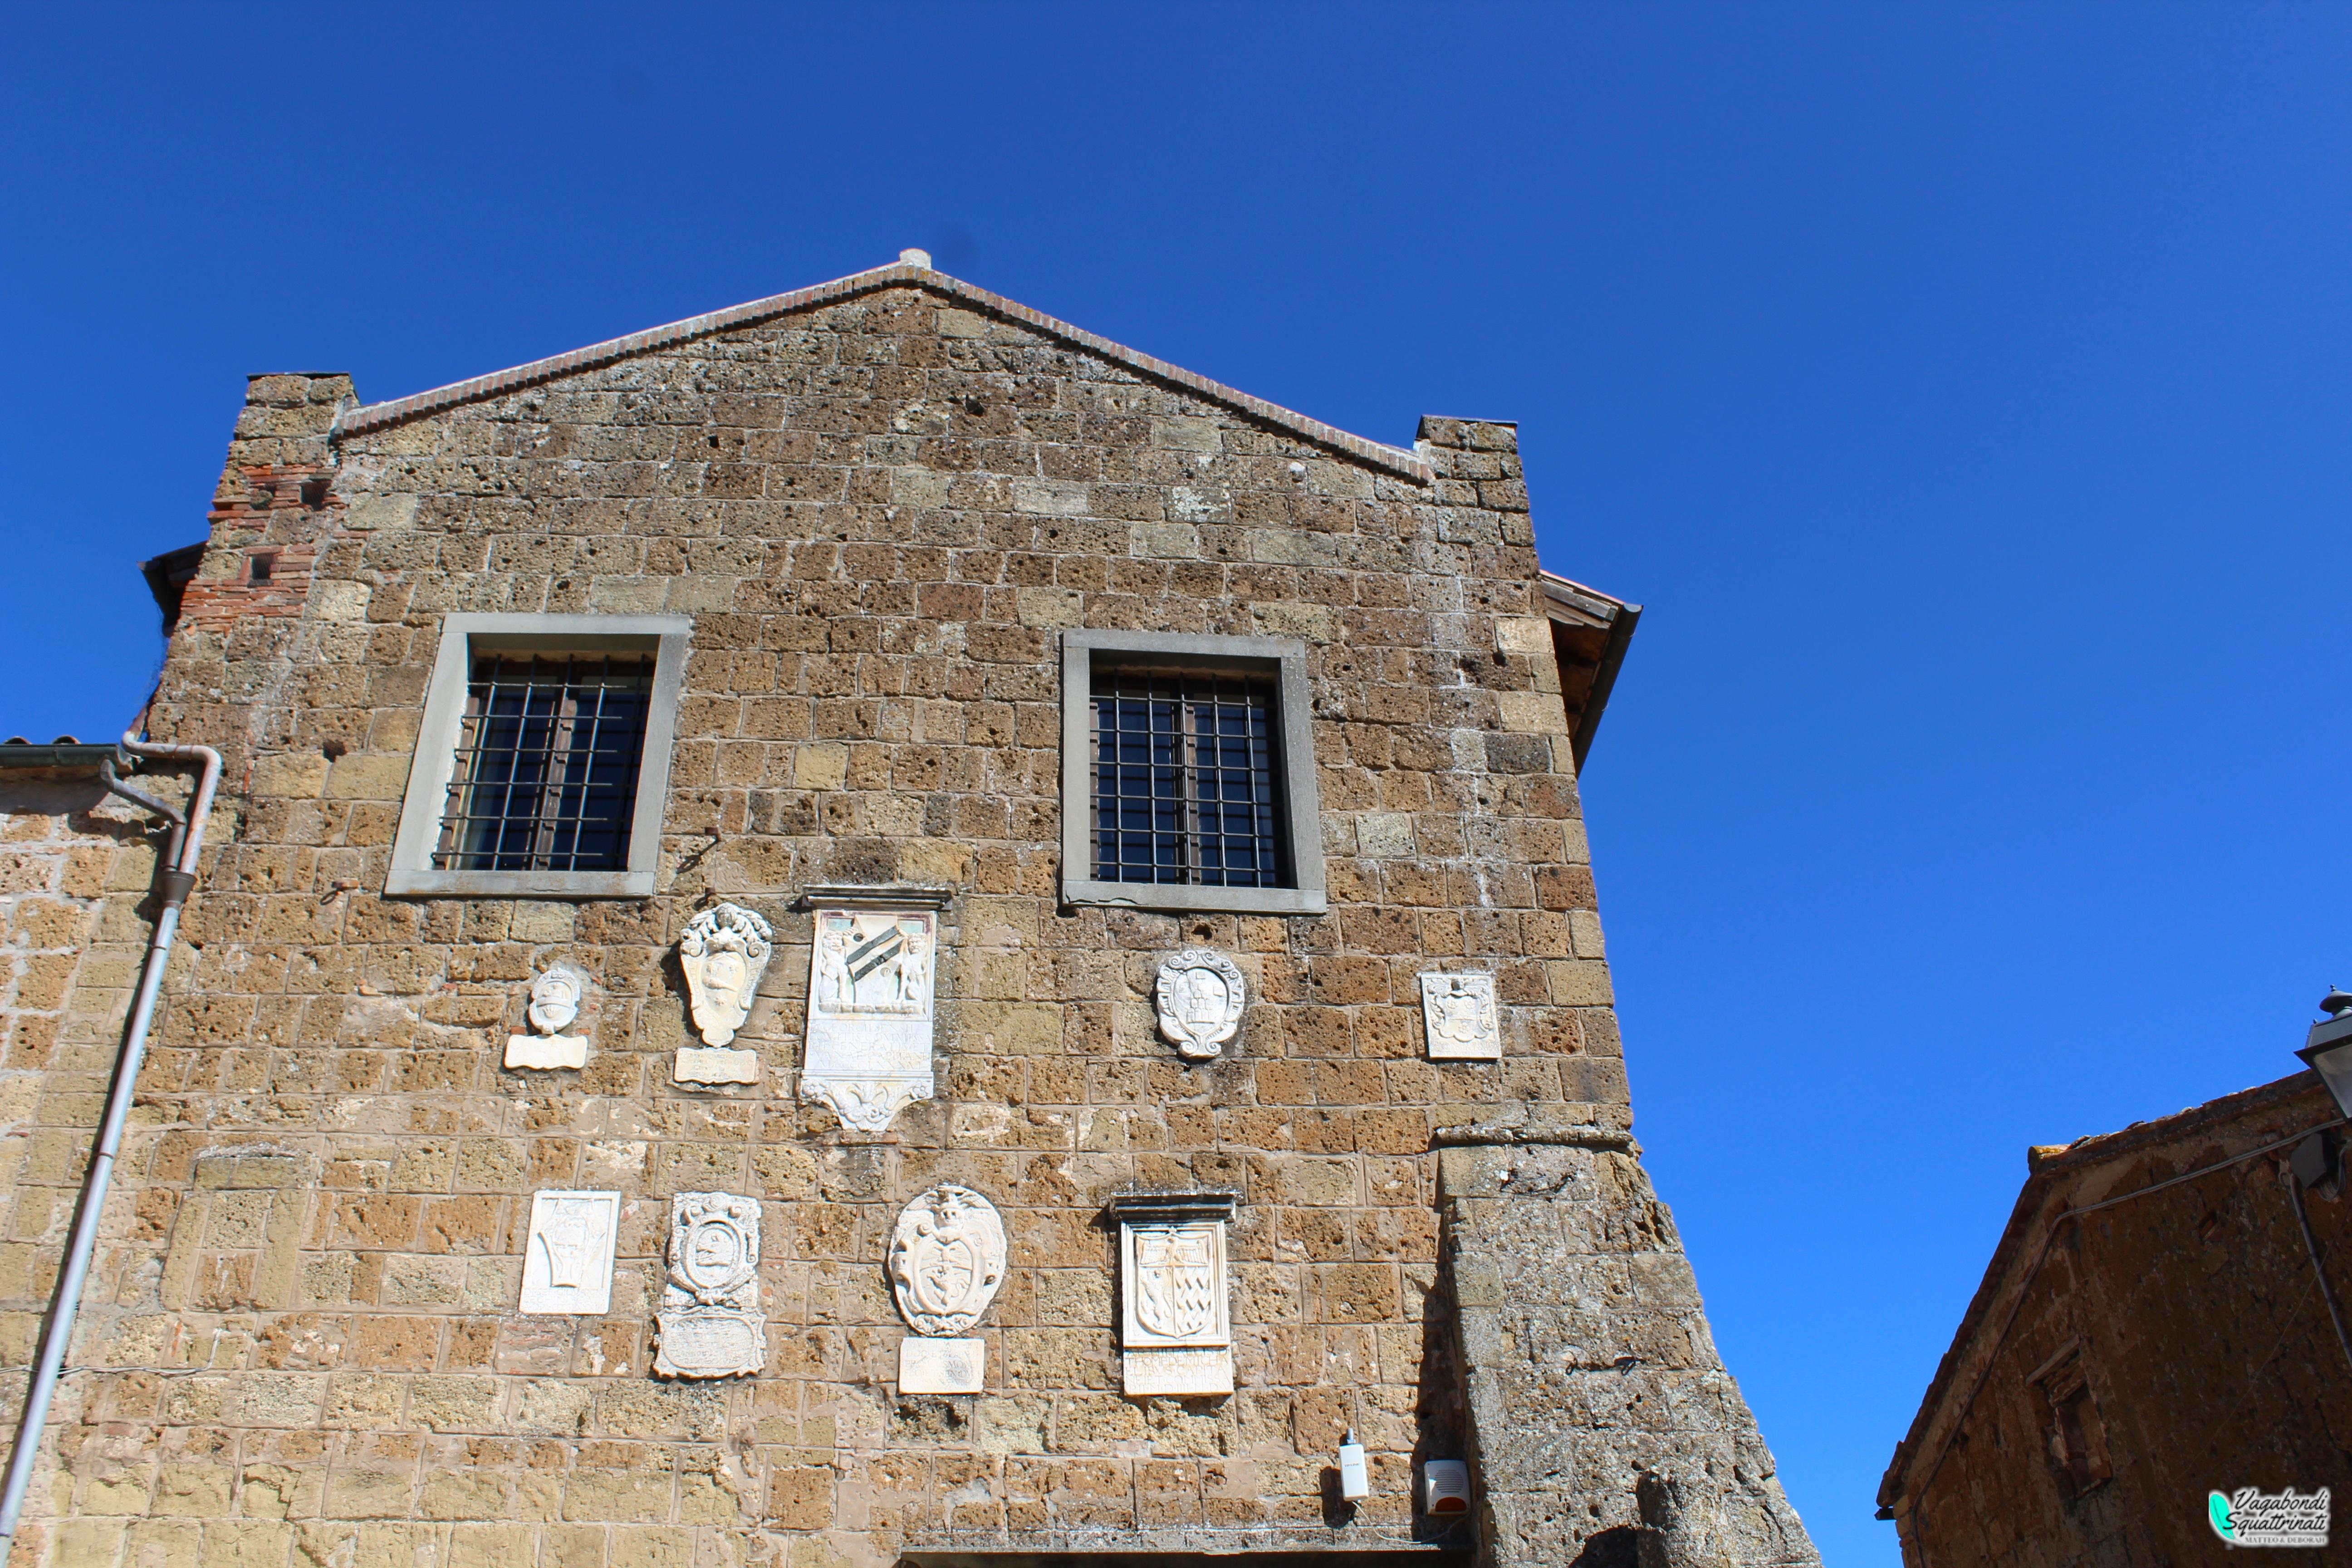 I borghi del tufo in Toscana: Sovana